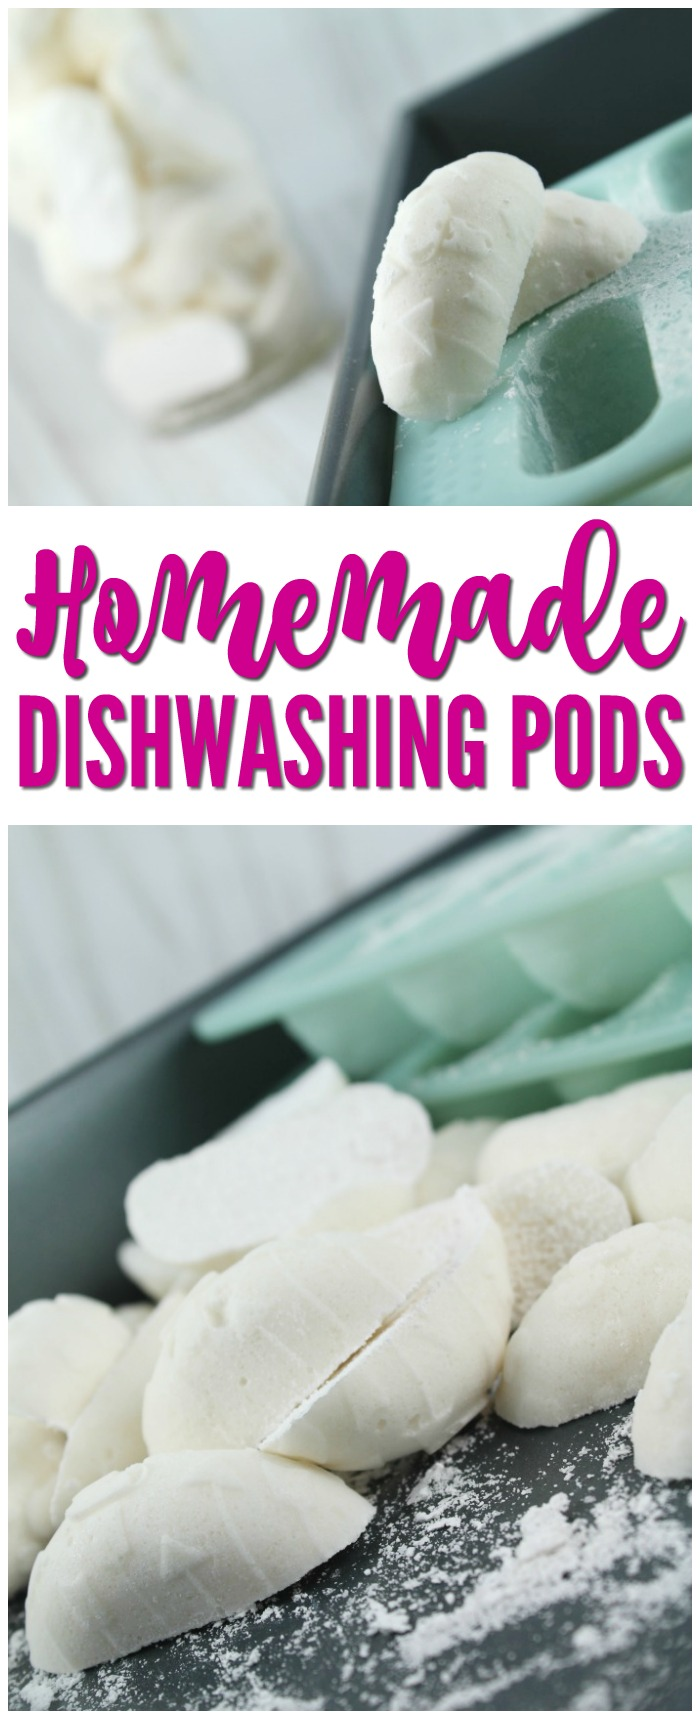 Homemade Dishwashing Pods!